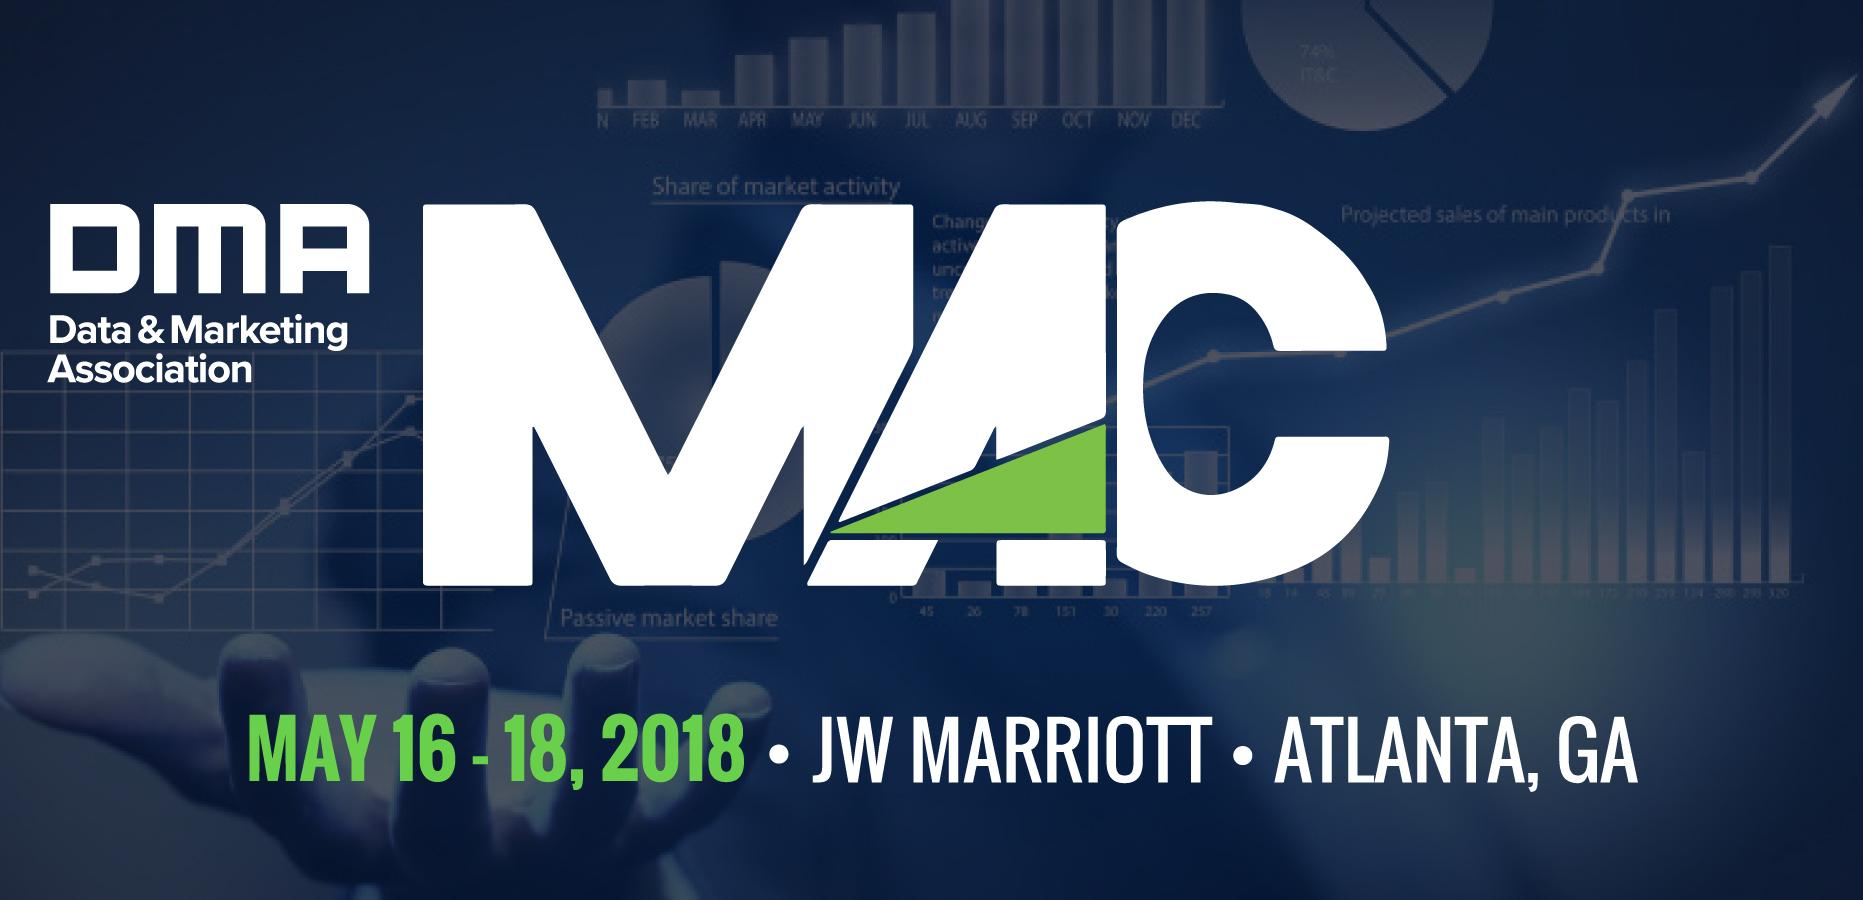 DMA's 2018 Marketing Analytics Conference